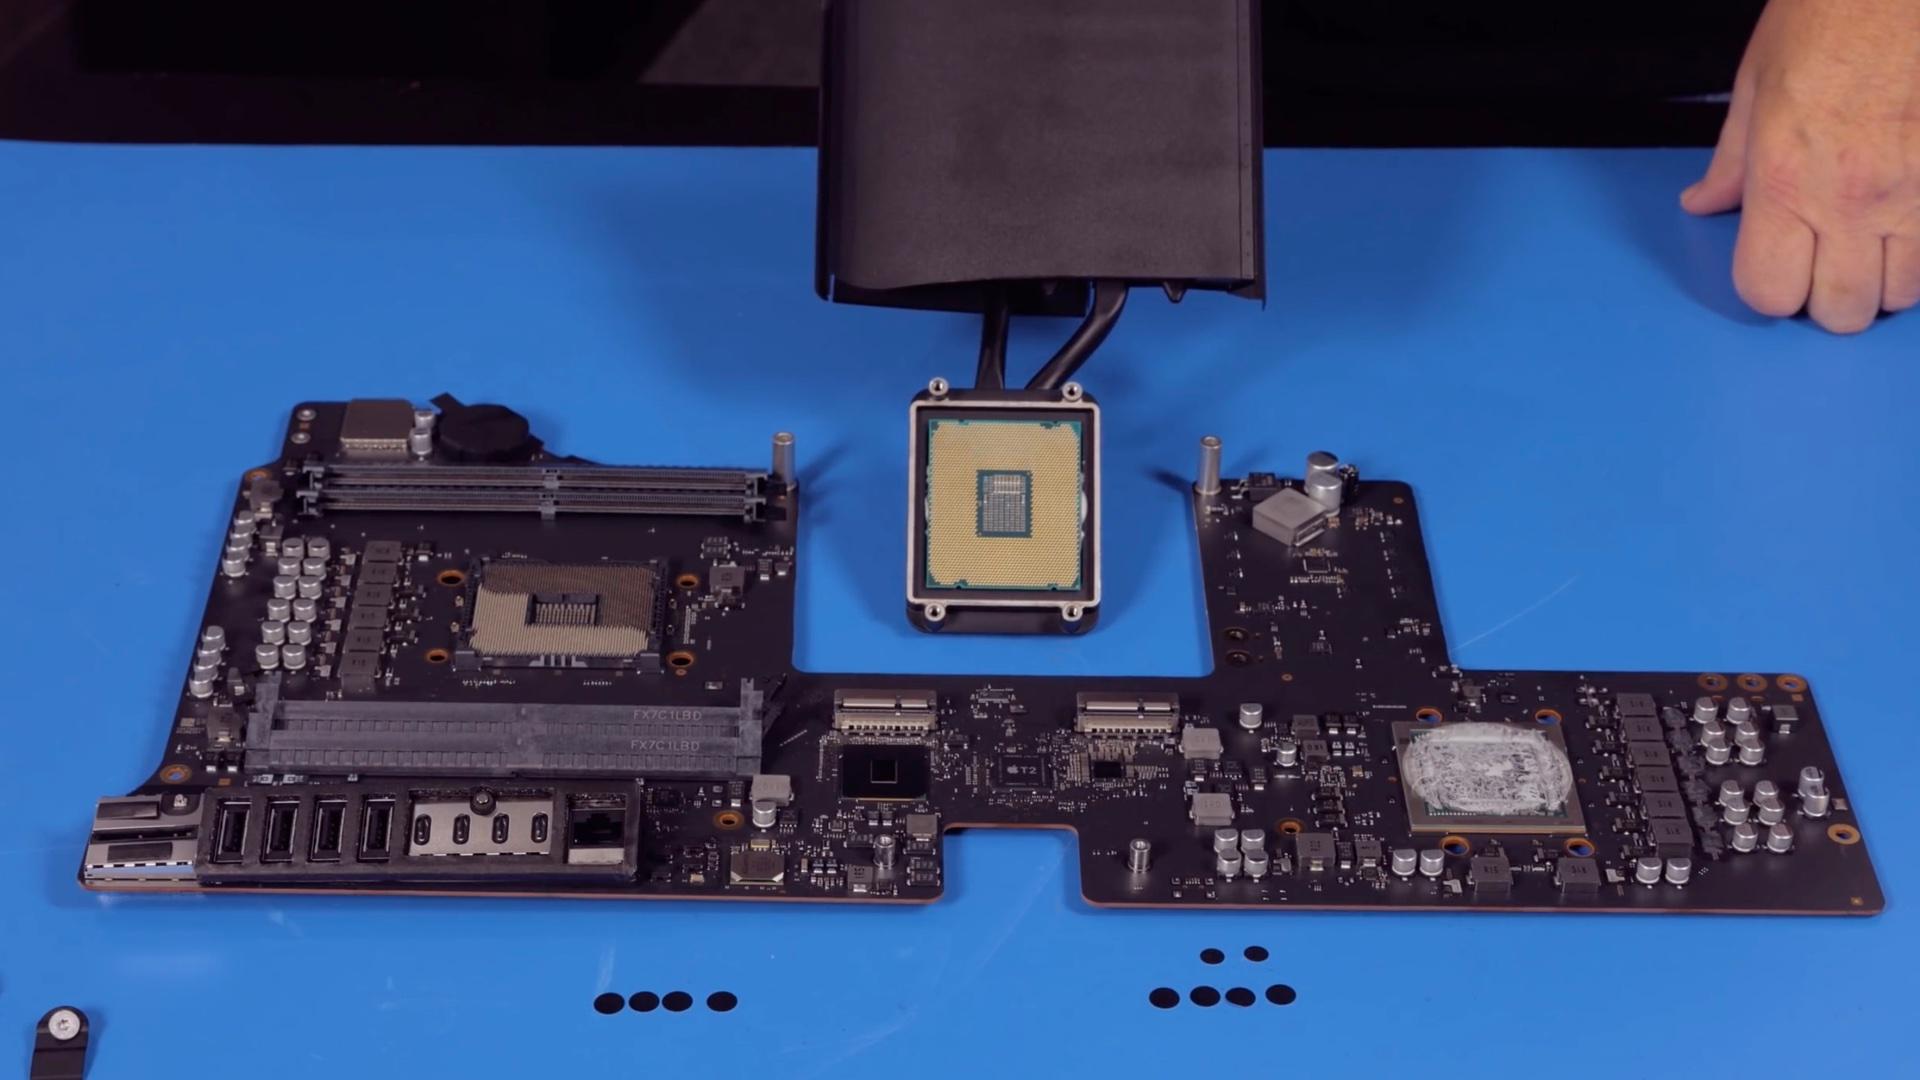 Base model iMac Pro teardown sheds more light on its upgrade